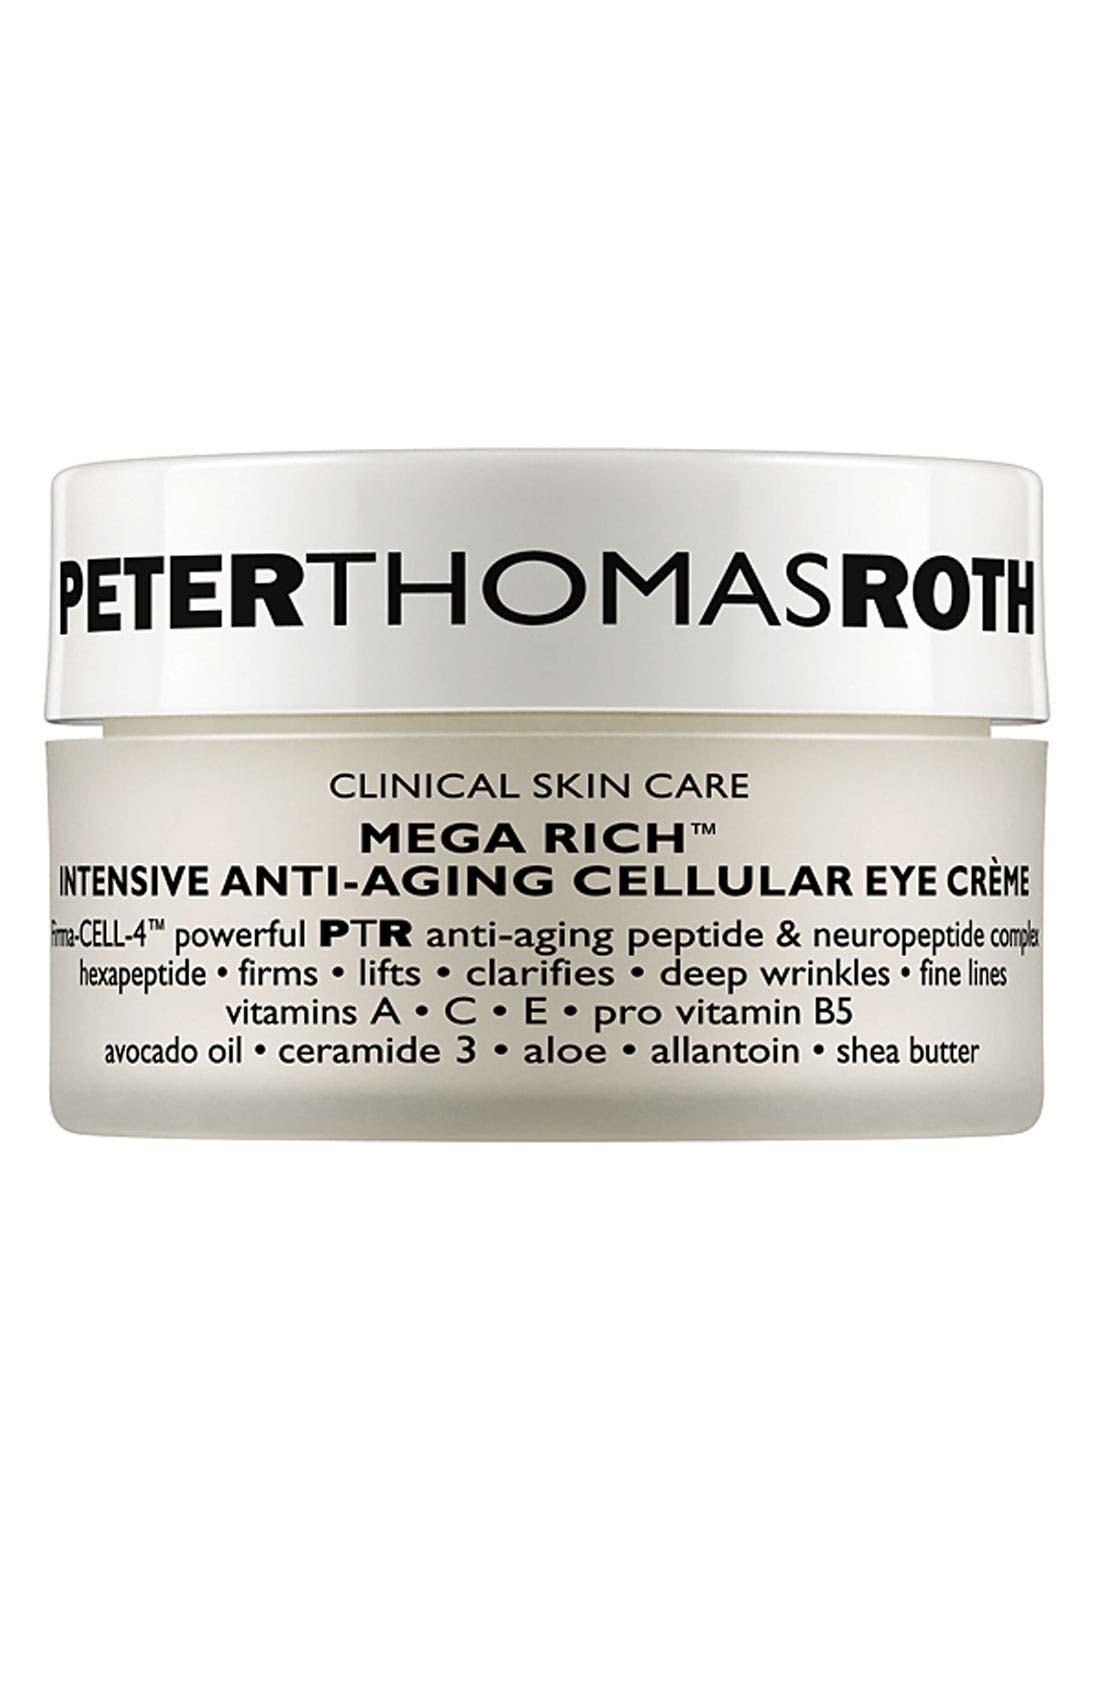 Mega Rich Intensive Anti-Aging Cellular Eye Crème,                             Main thumbnail 1, color,                             000